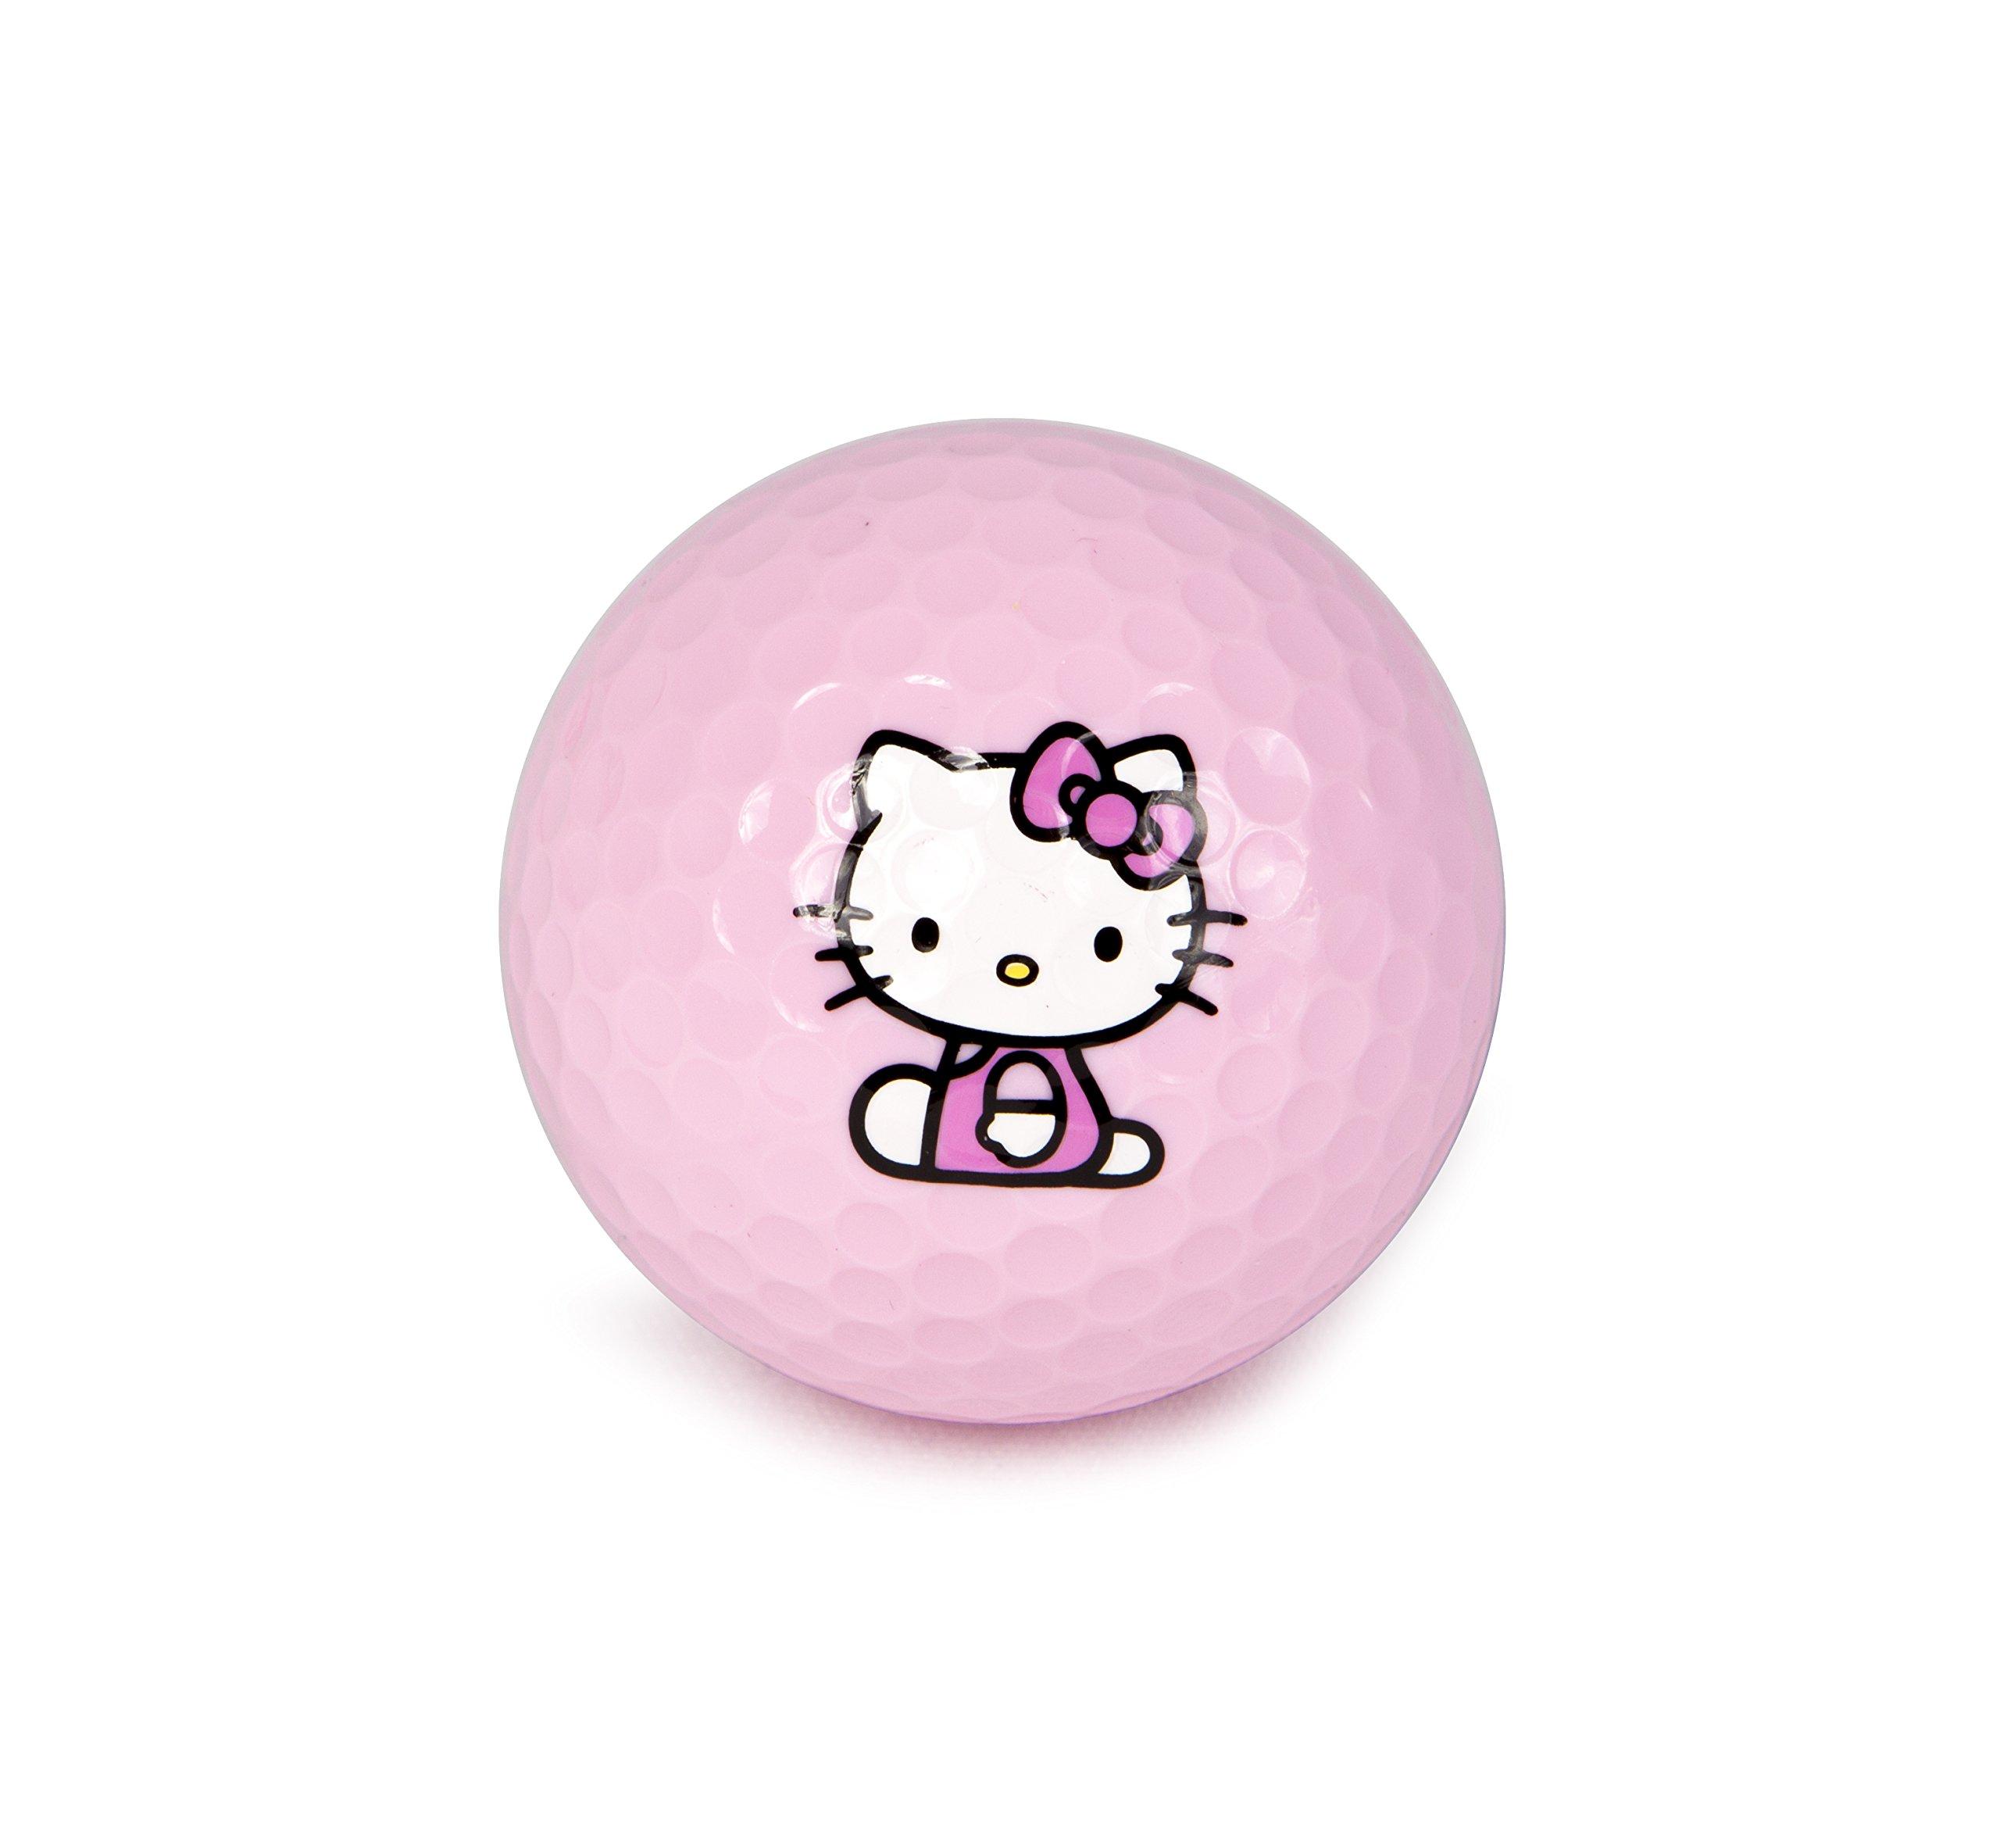 Hello Kitty Golf 3 Item - Kit -''The Collection'' Golf Balls (6 balls) + Hello Kitty Sports Script Hat (1 pc.) + Hello Kitty Premier Collection Divot Tool (1 pc.) by Hotshots (Image #3)